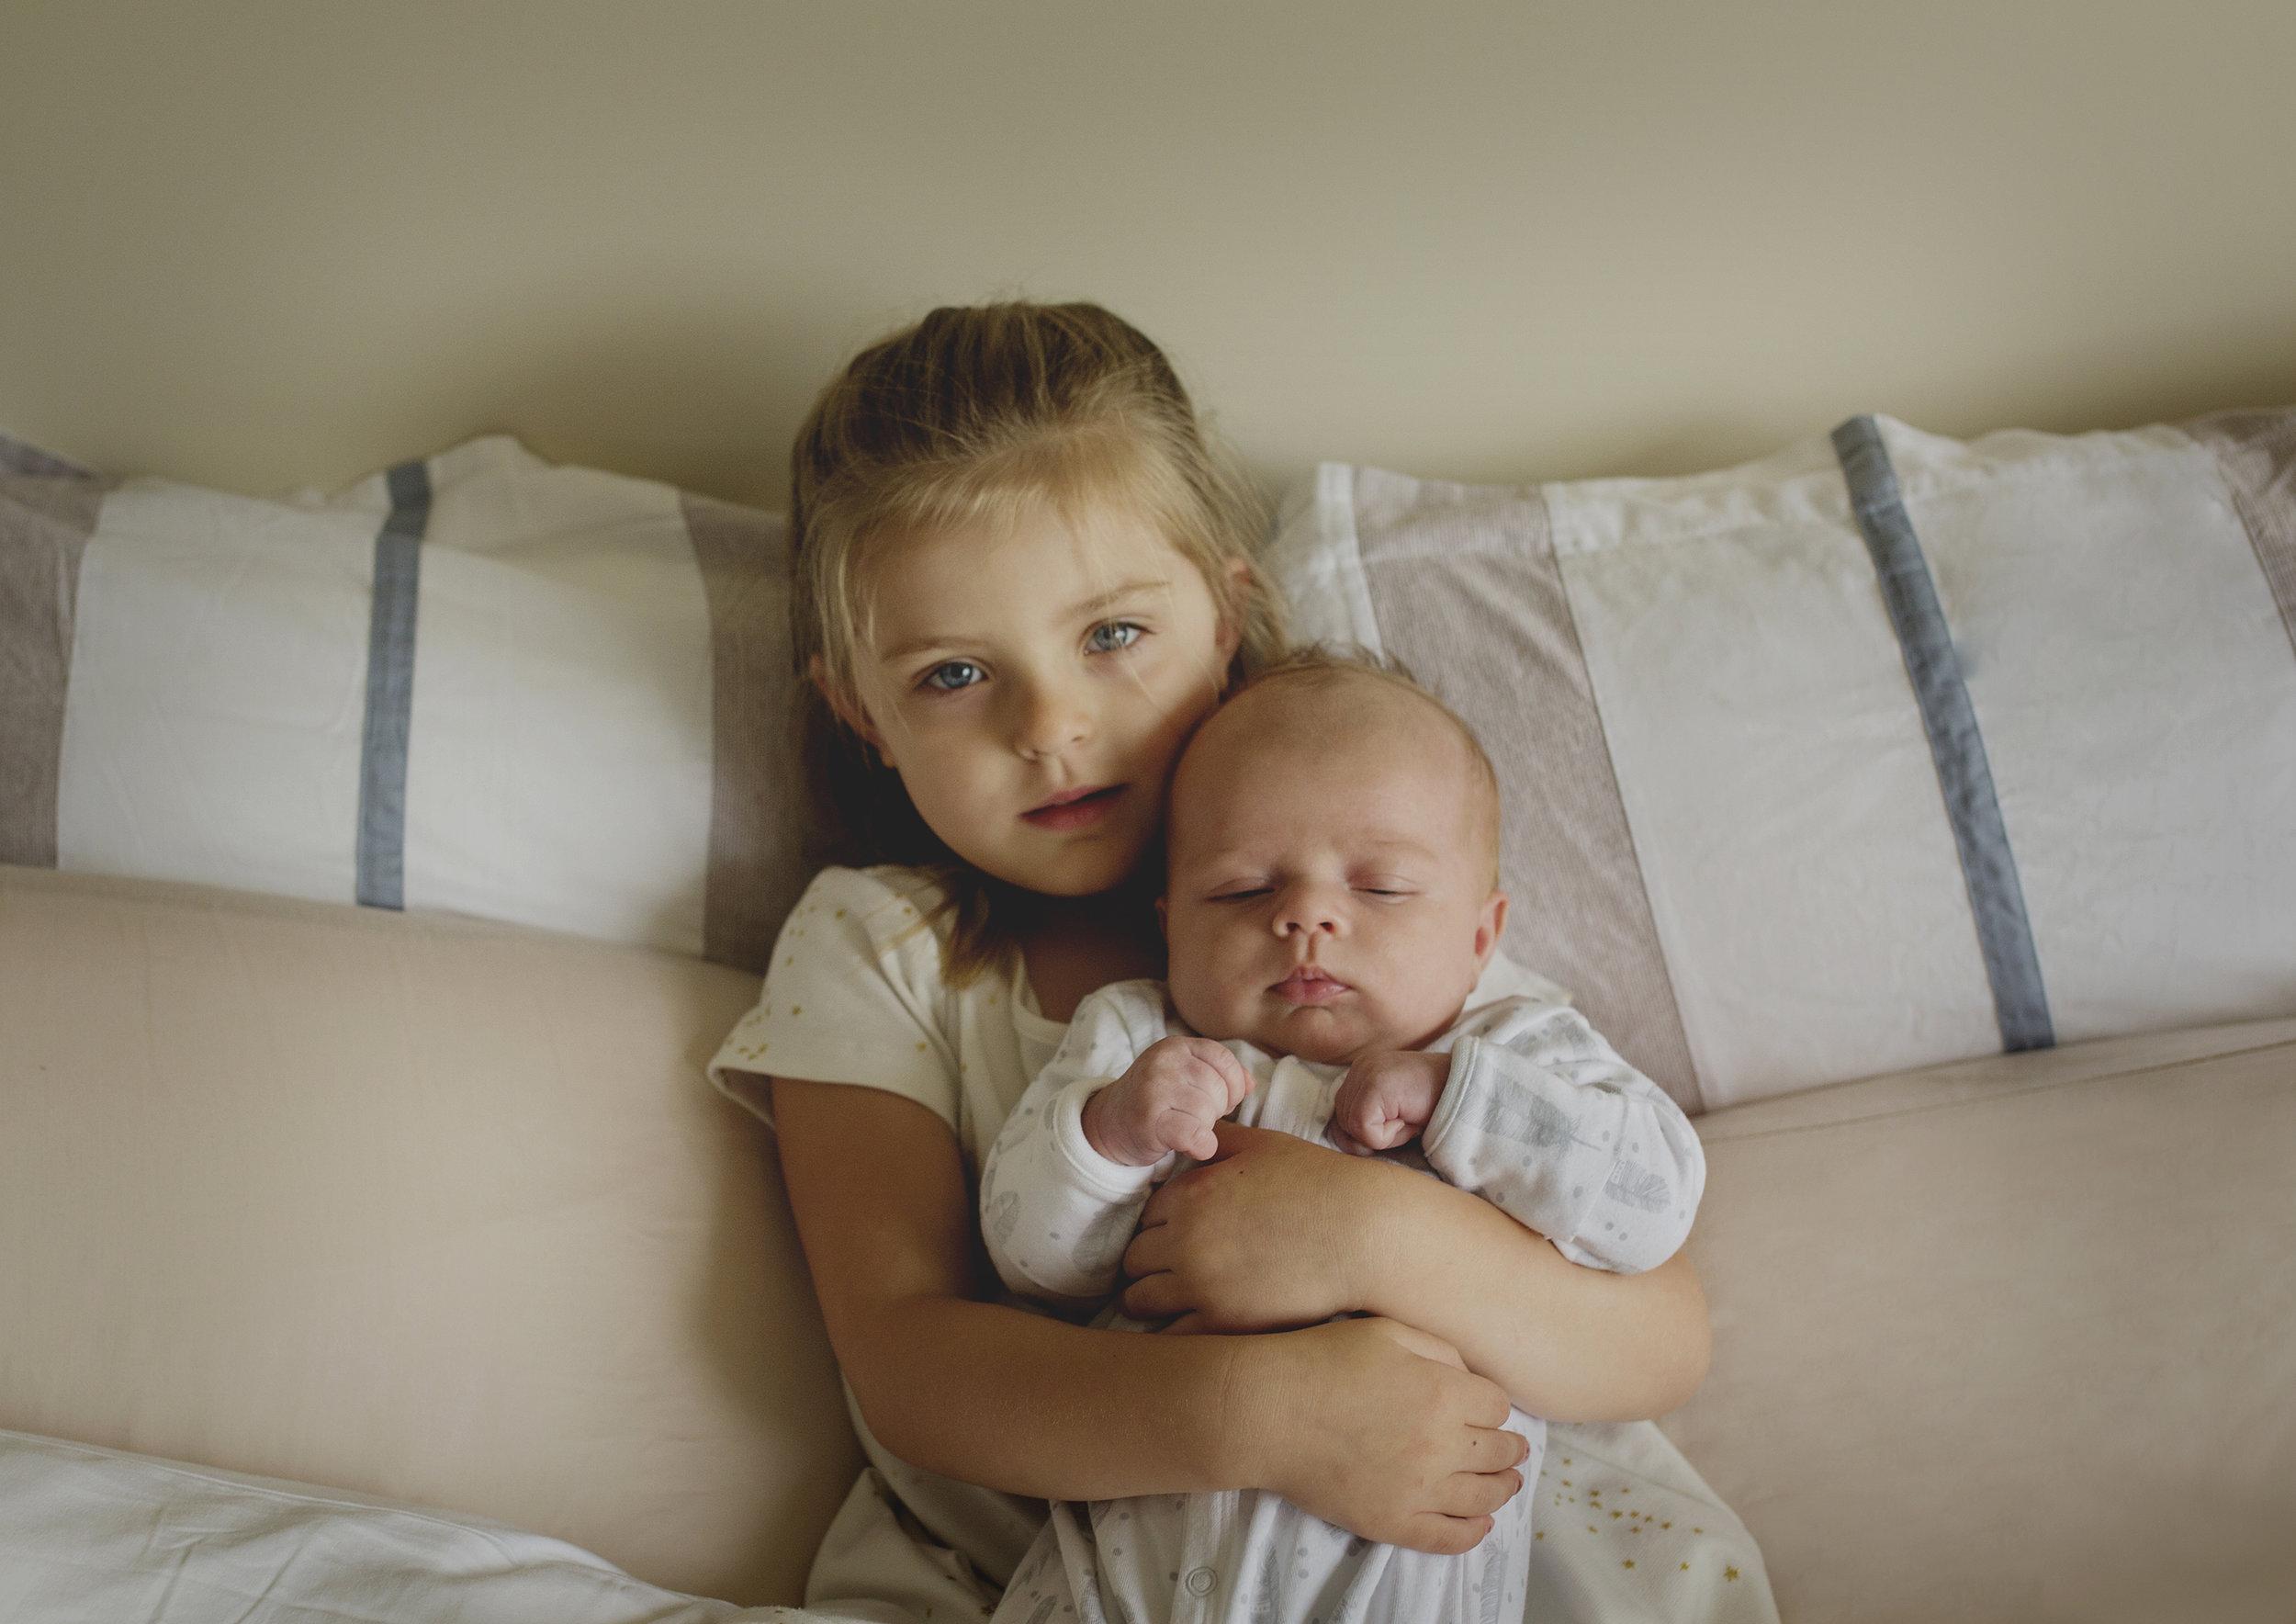 Big sister cuddling her newborn baby brother!